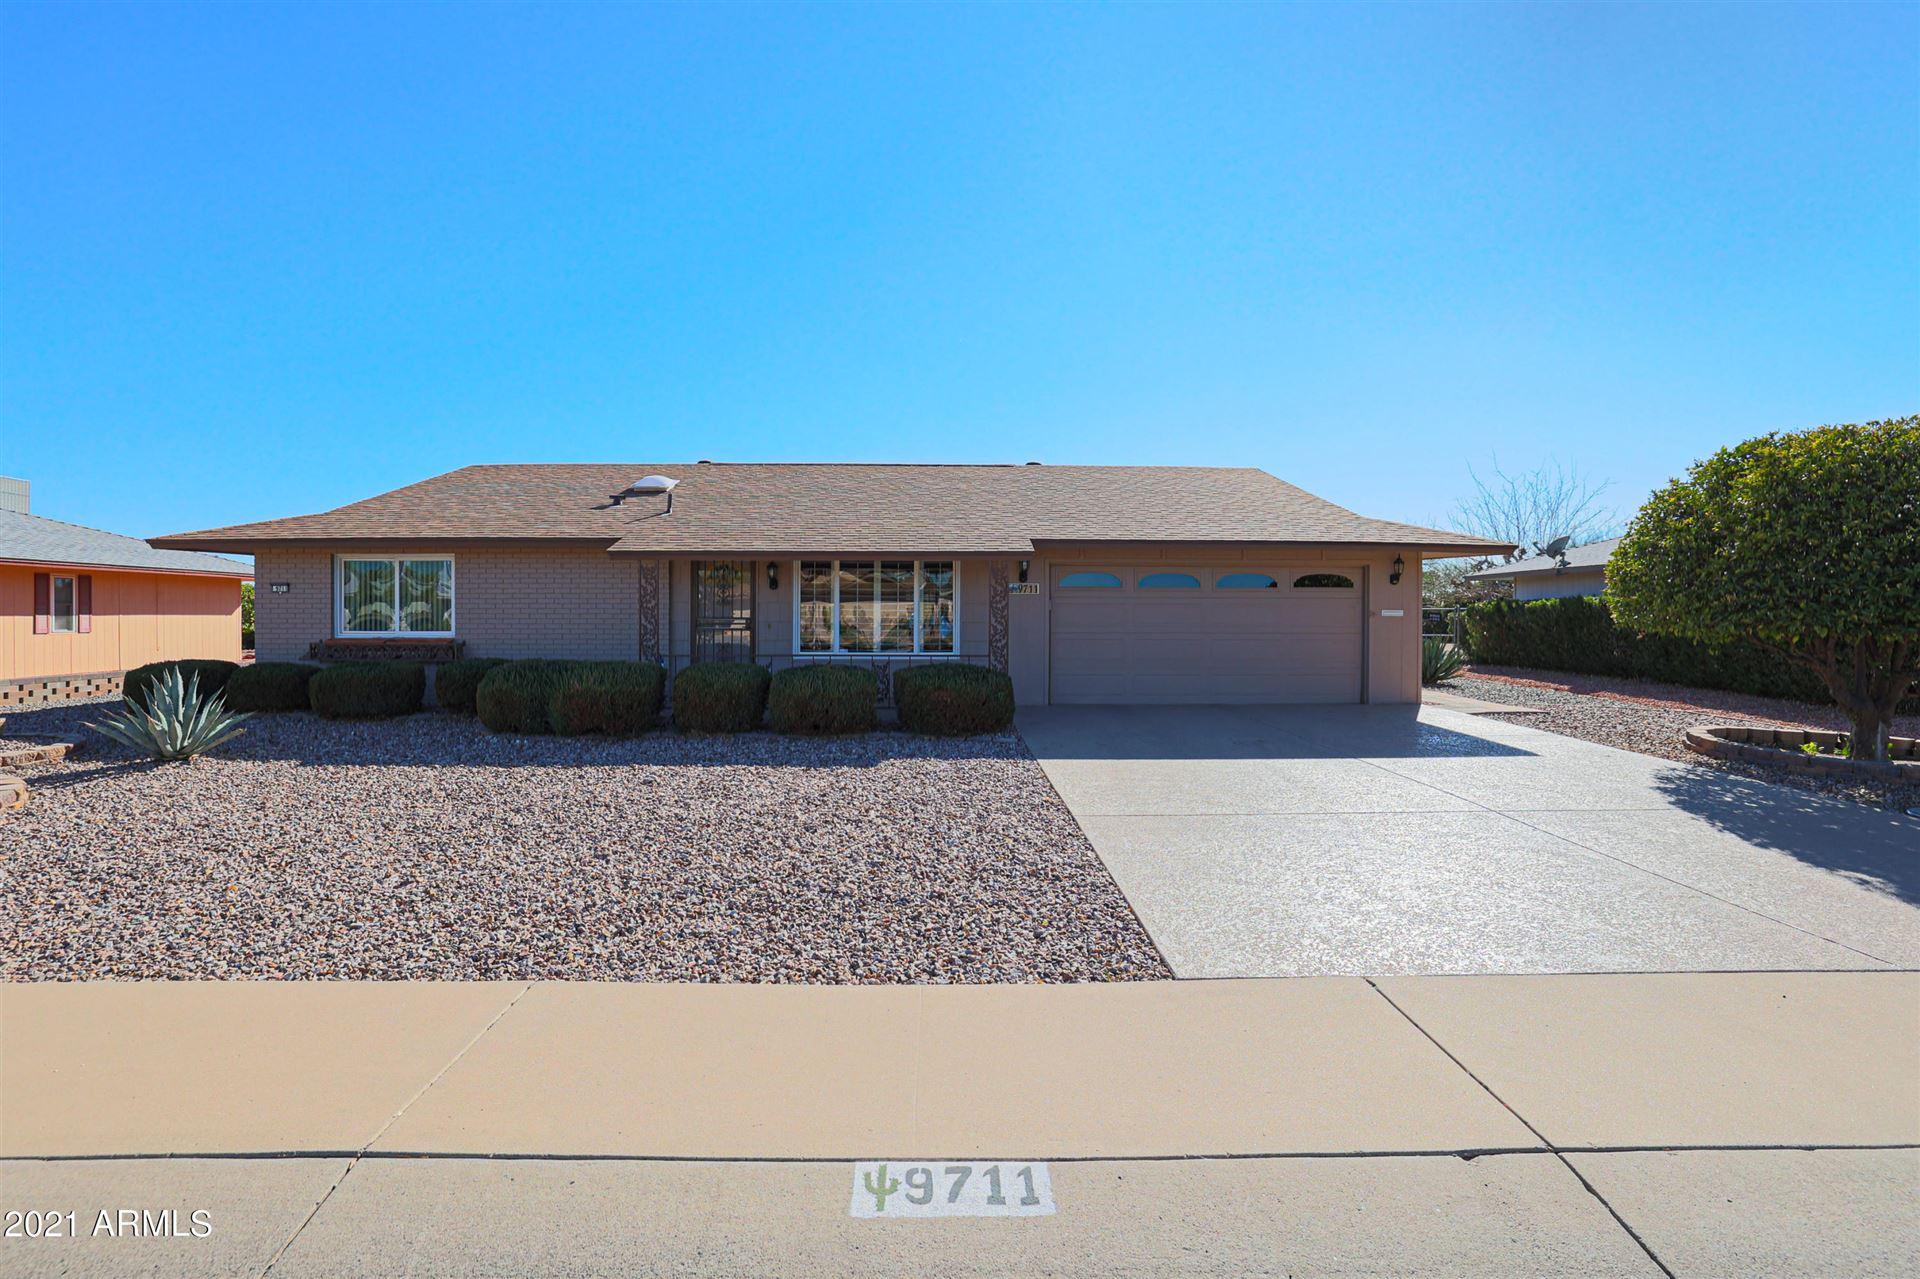 Photo of 9711 W RIVIERA Drive, Sun City, AZ 85351 (MLS # 6199299)